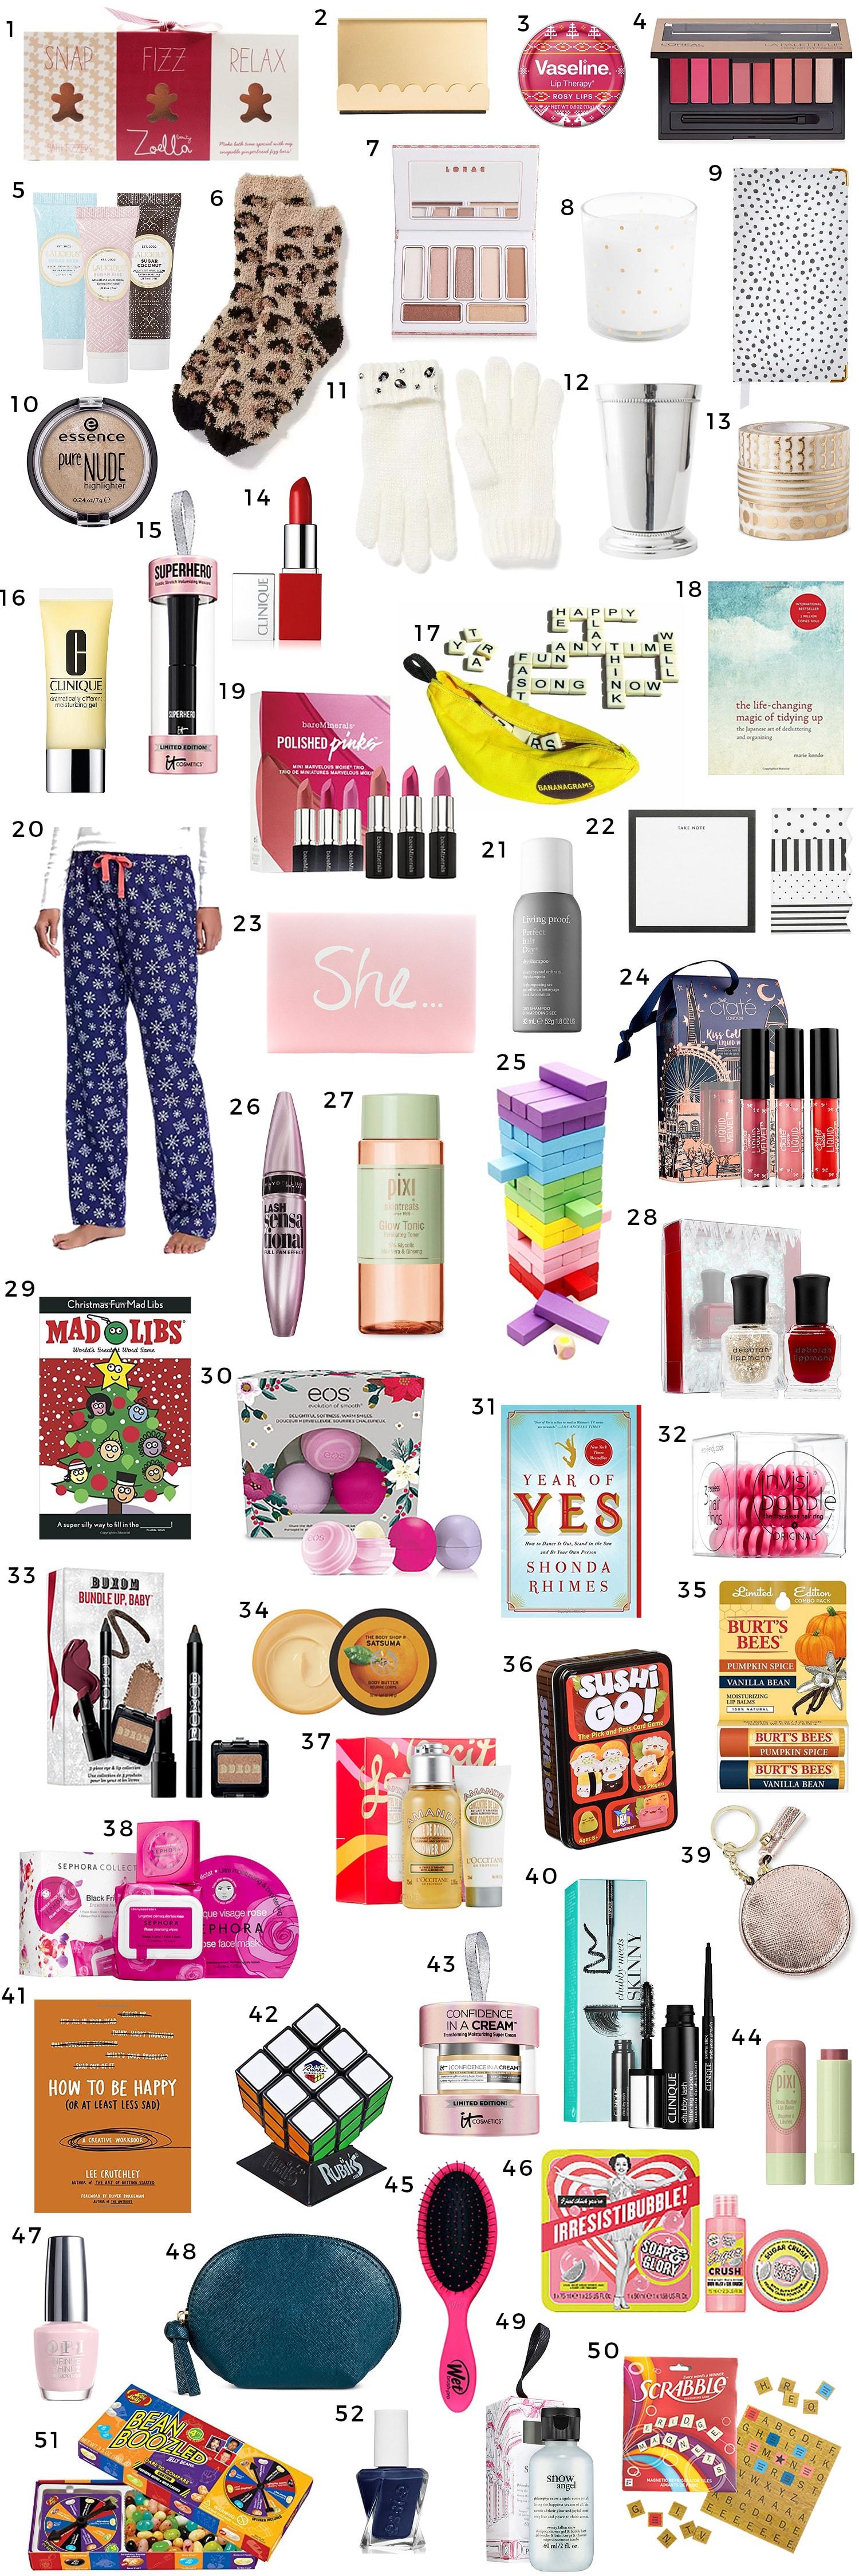 best-stocking-stuffer-gift-ideas-women-1